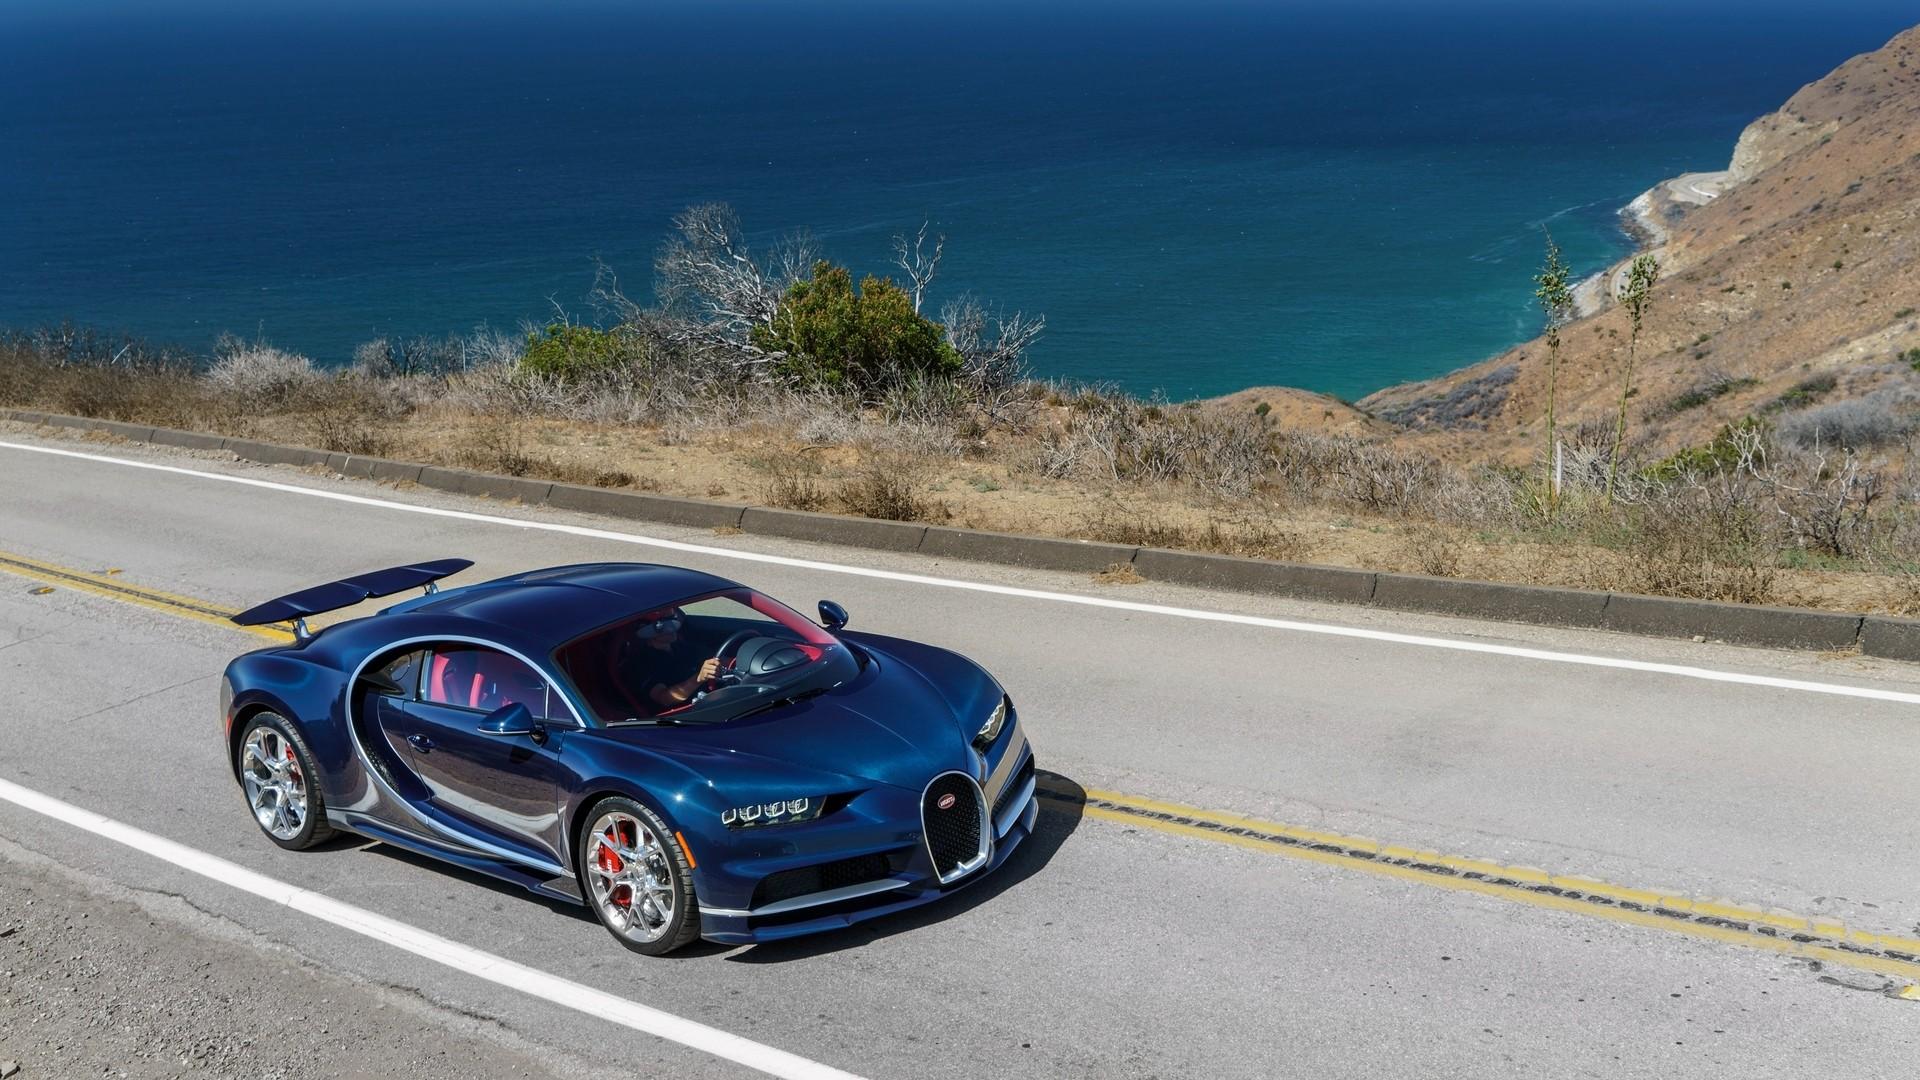 Bugatti Chiron full screen hd wallpaper